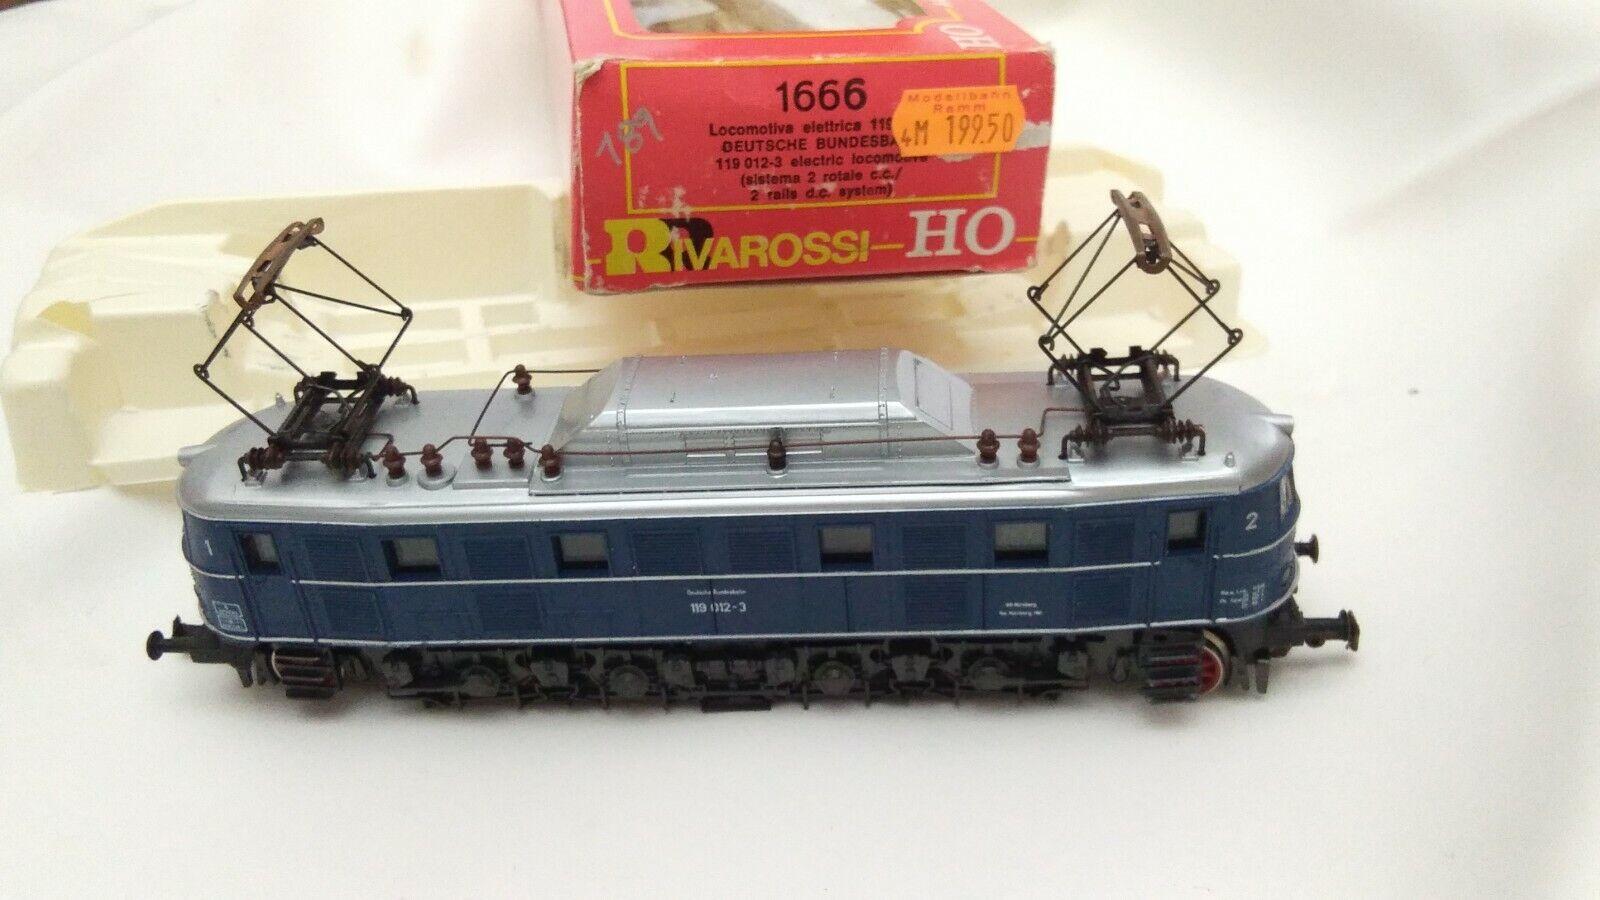 RIVAROSSI Locomotore Elettrico della DB 1666 119 0123 HO